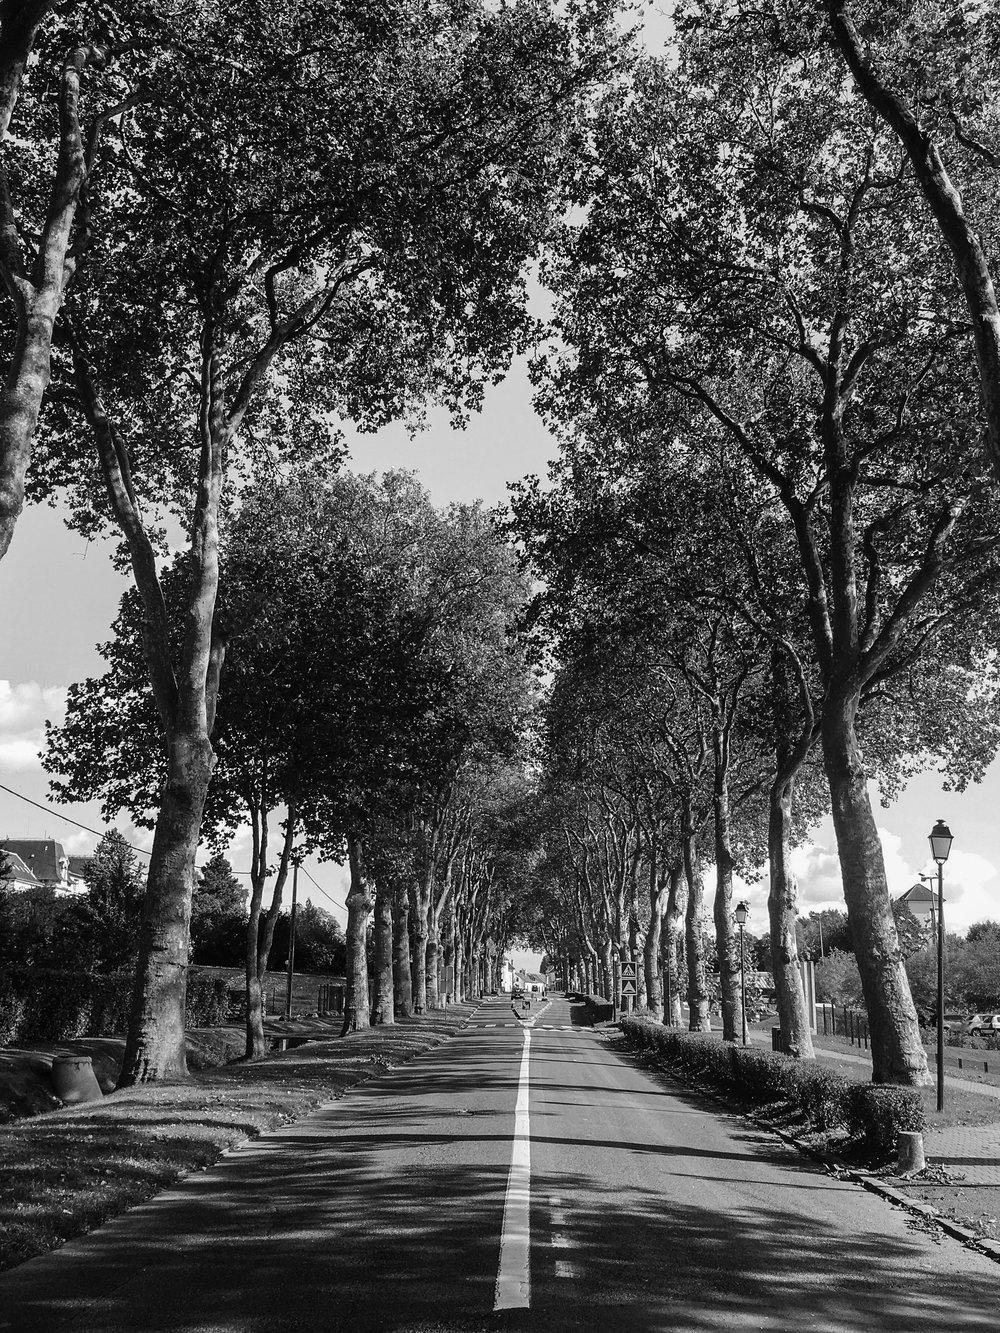 Tom_Oliver_Payne_London_to_Paris_Cycle-15.jpg